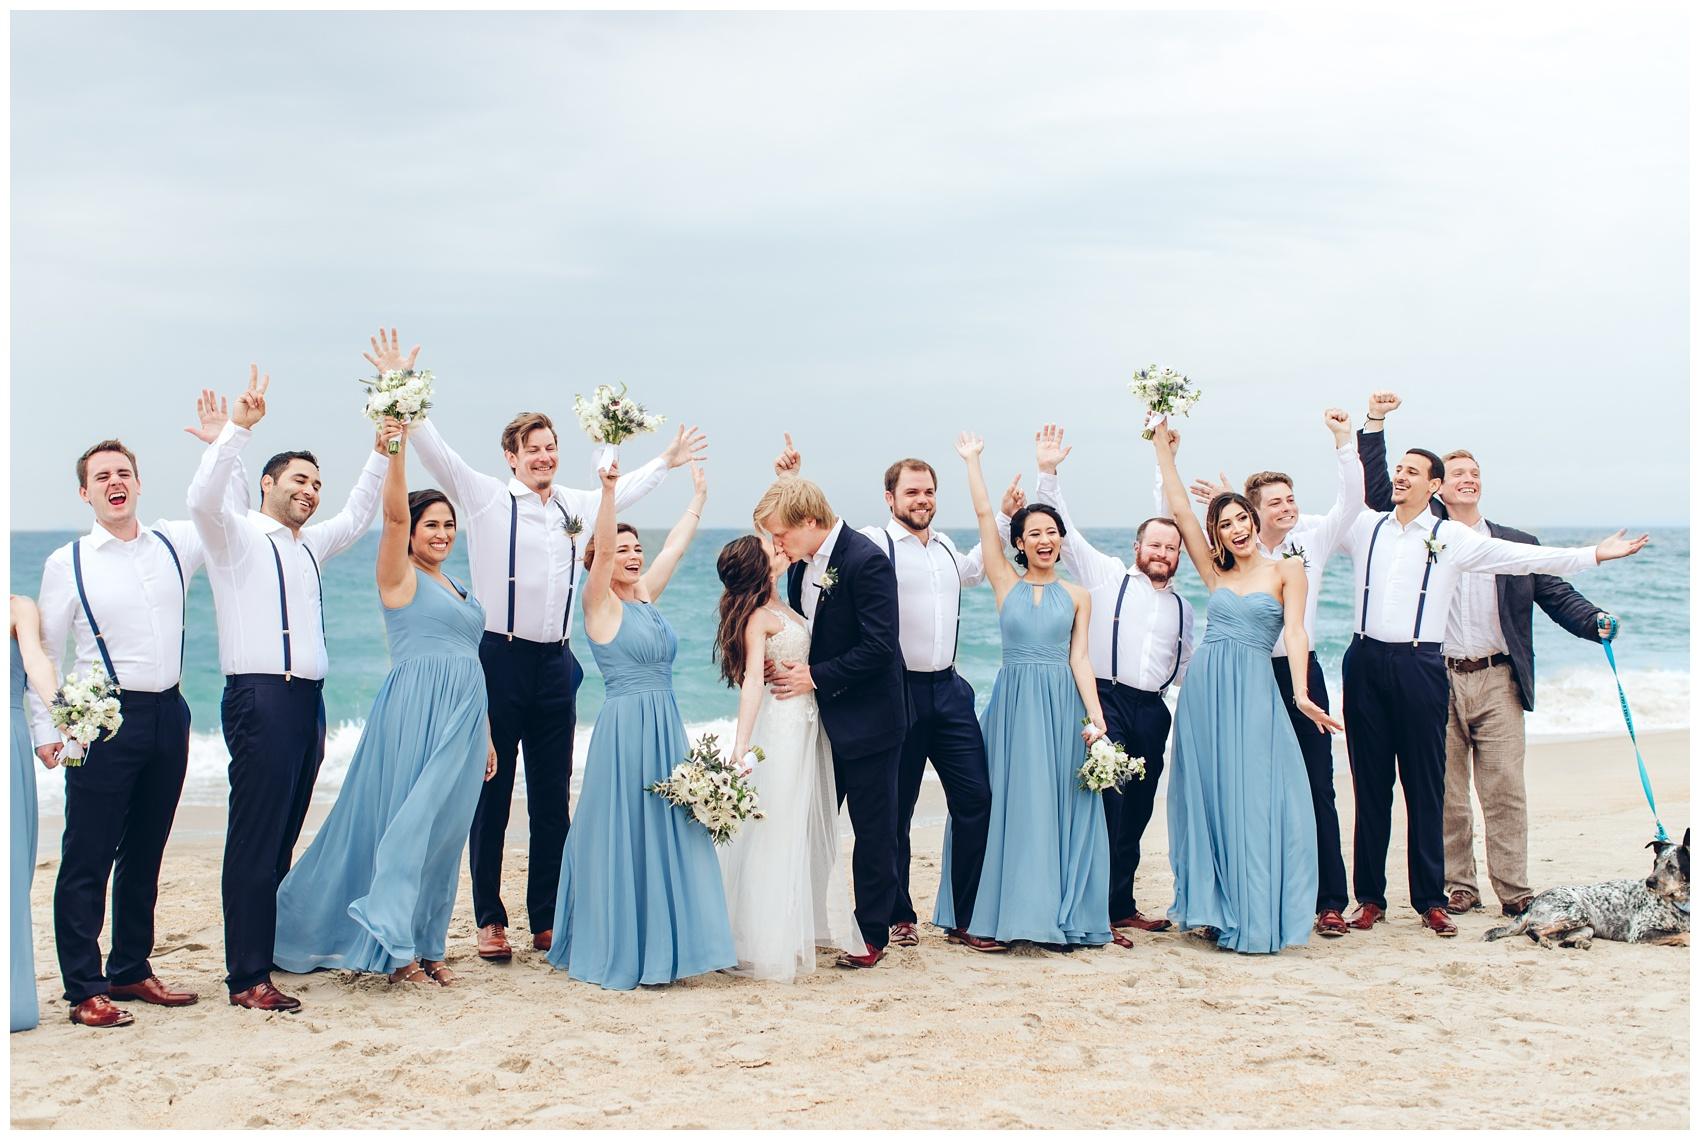 Outer-Banks-Corolla-Wedding_0079.jpg